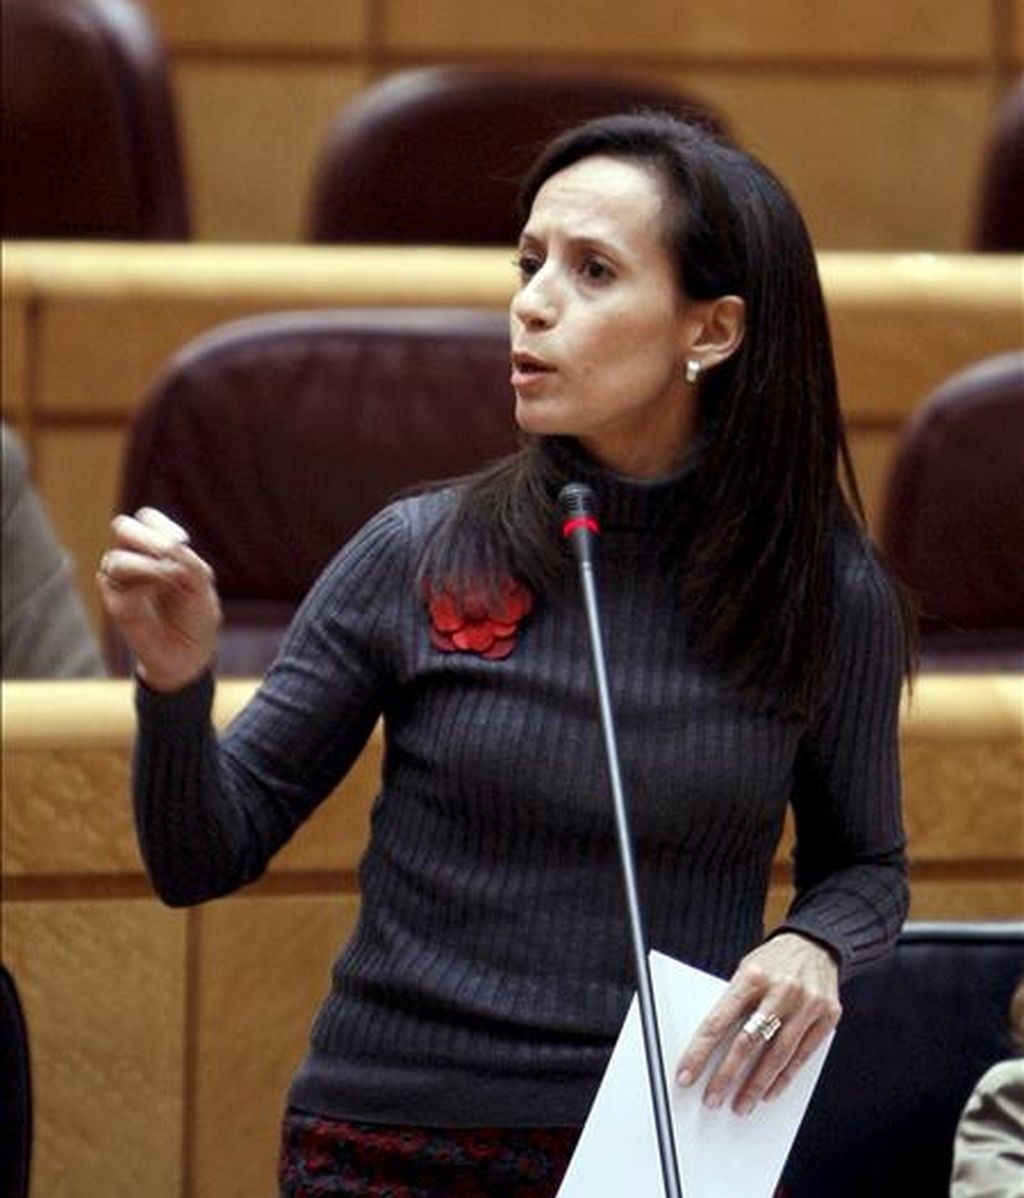 La ministra de Vivienda, Beatriz Corredor. EFE/Archivo